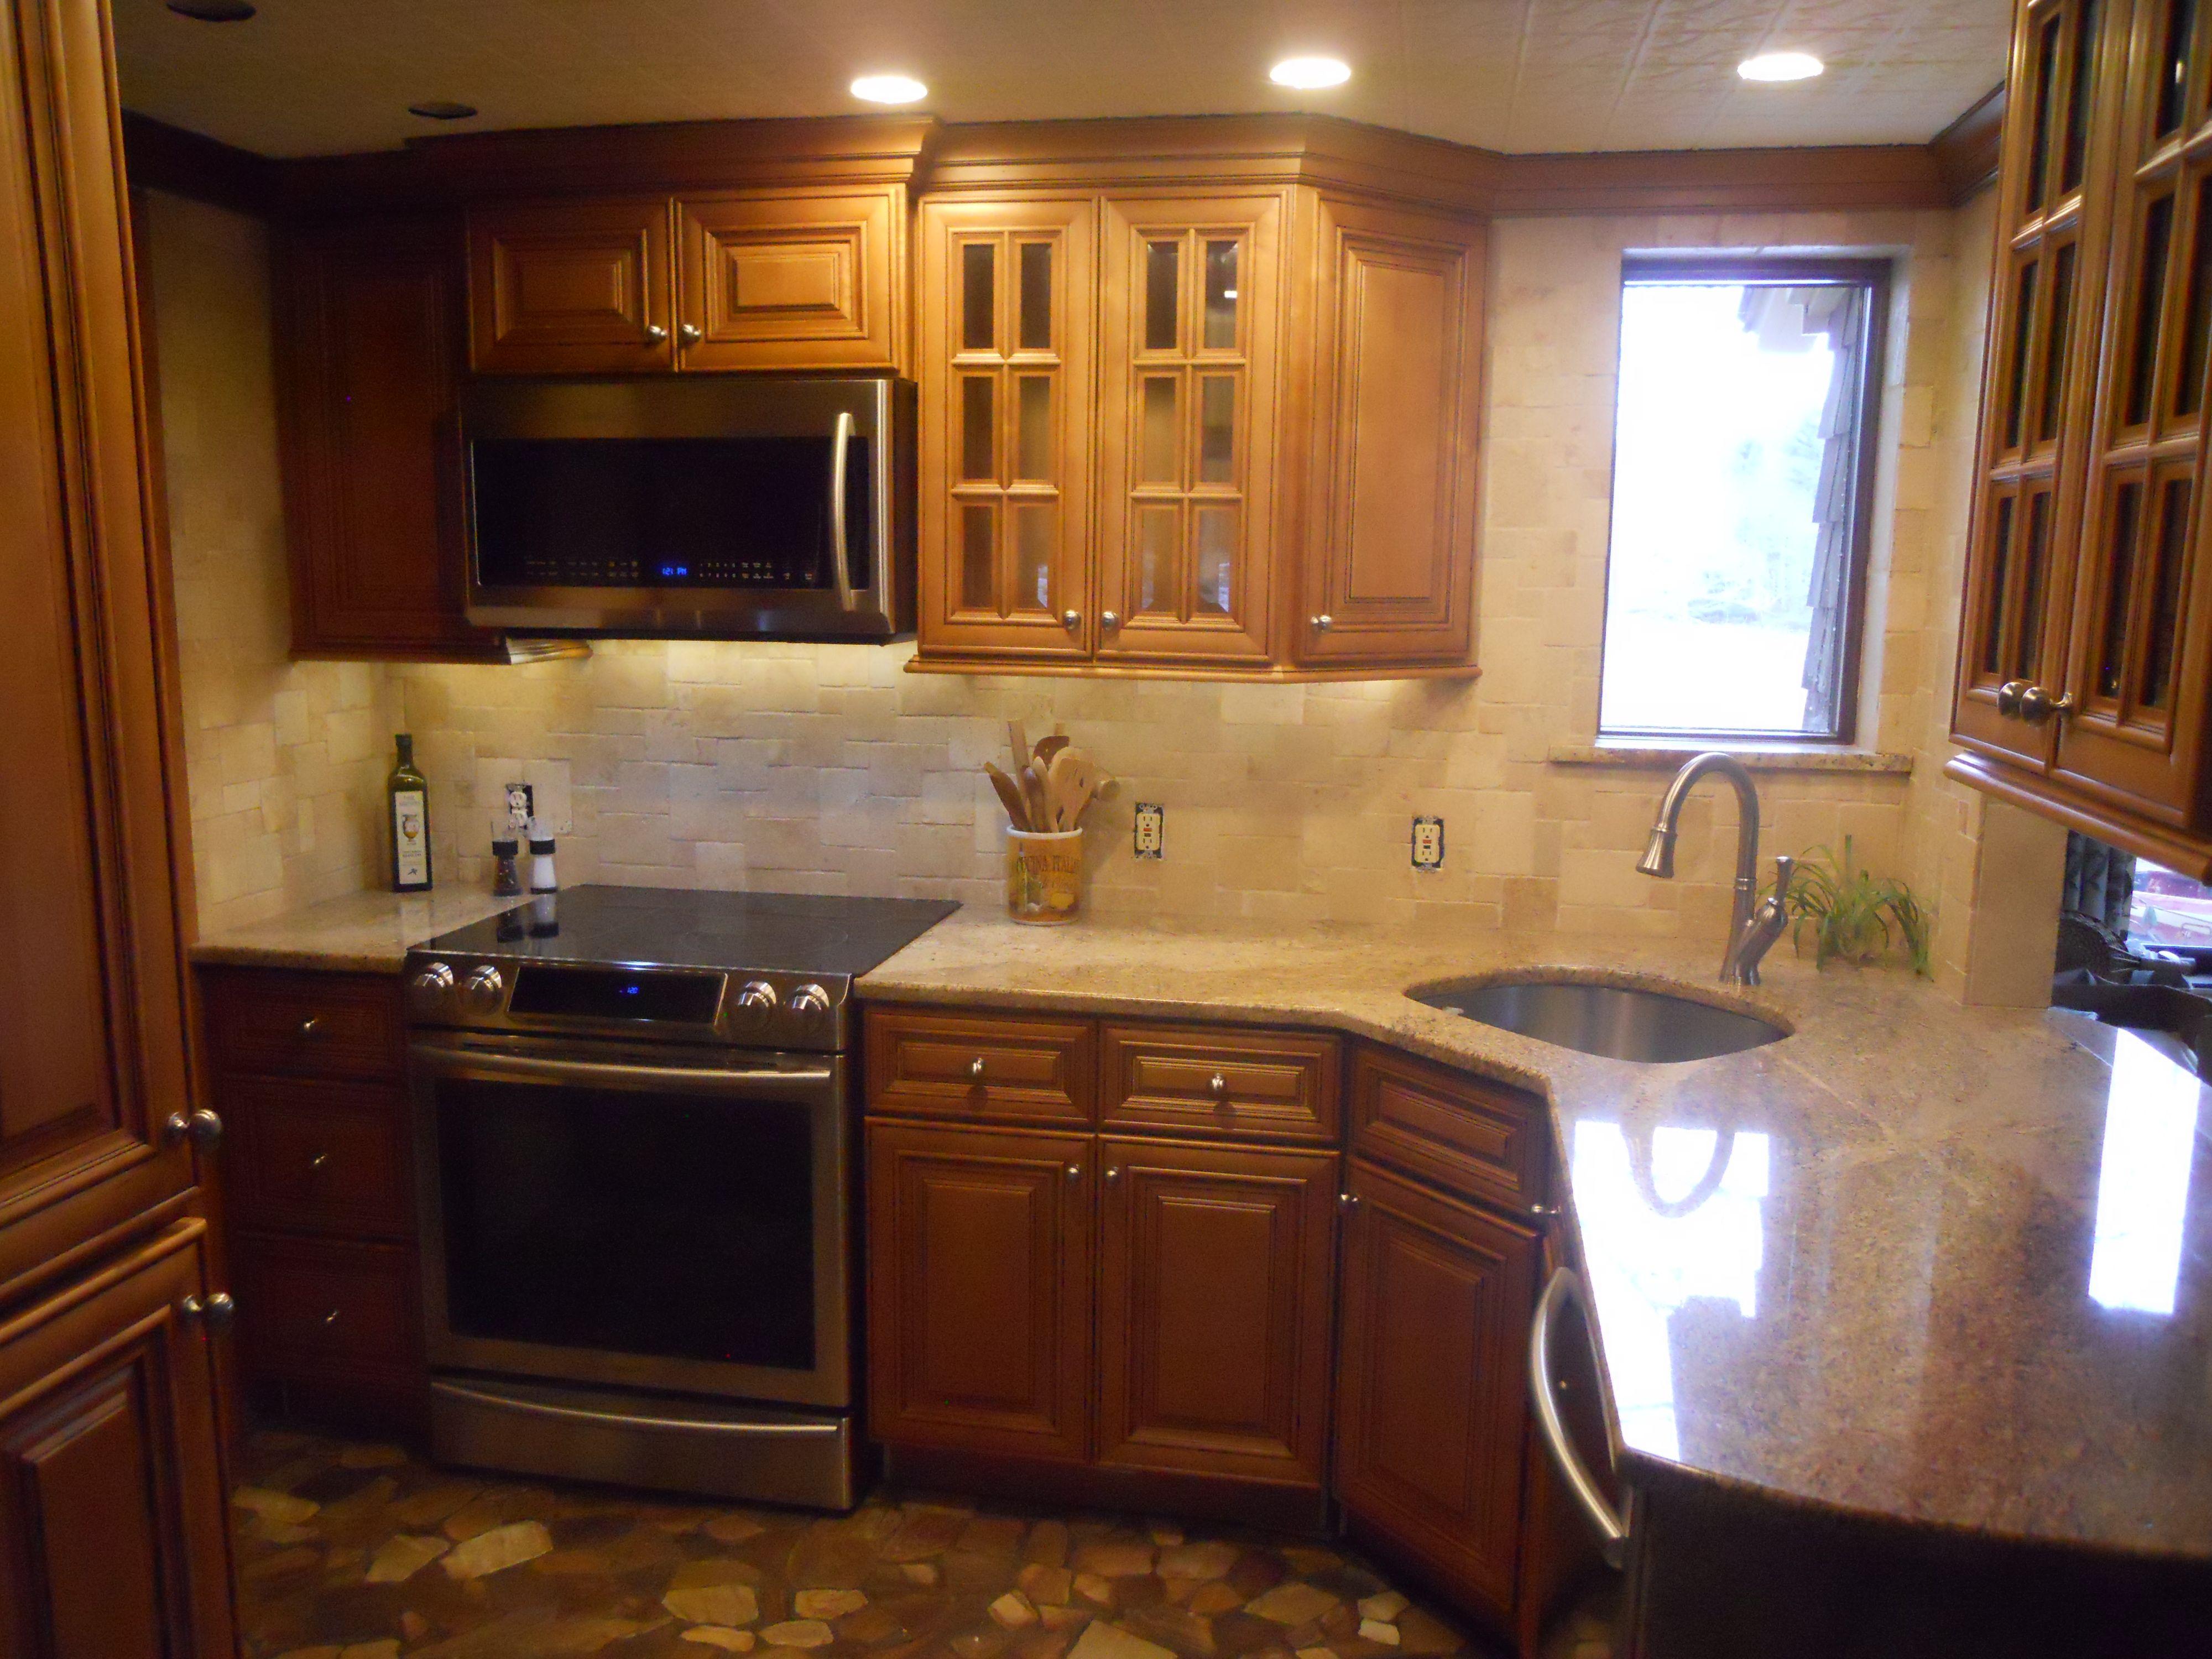 Charleston Toffee Small Kitchen Cabinets By Lily Ann Cabinets Kitchen Cabinets Small Kitchen Cabinets Kitchen